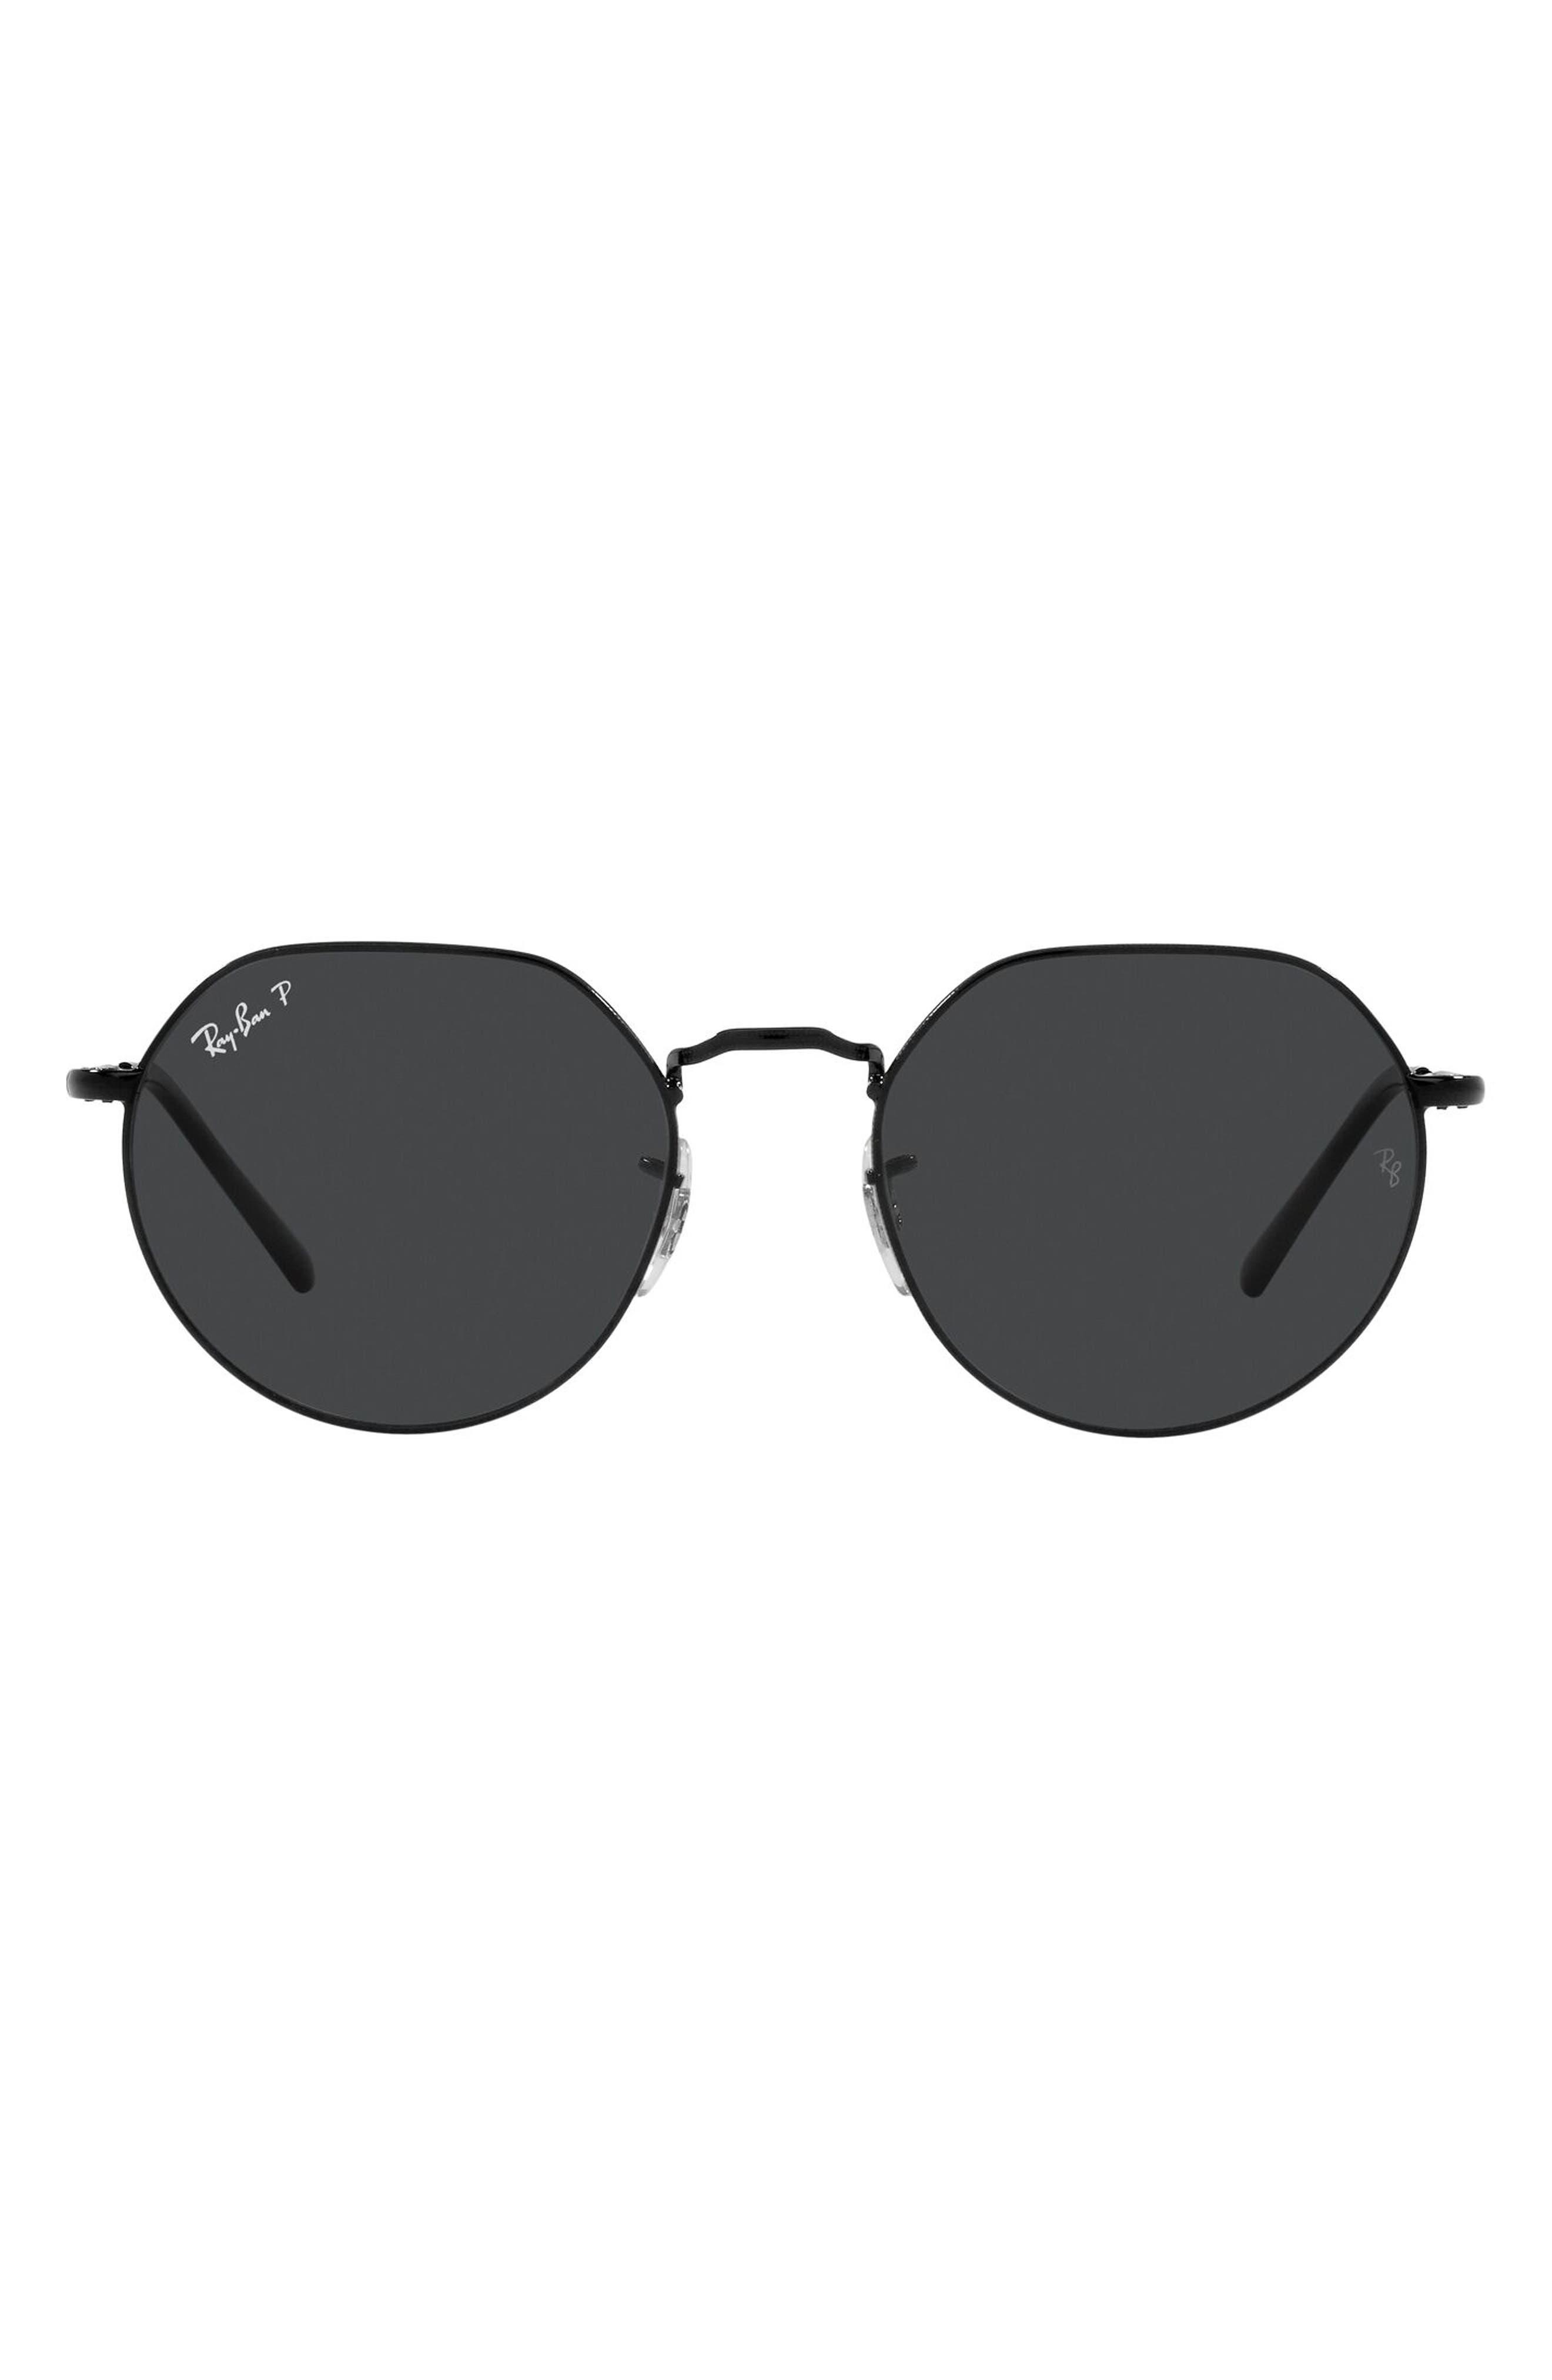 Women's Ray-Ban Jack 53mm Polarized Sunglasses - Black / Polarized Black